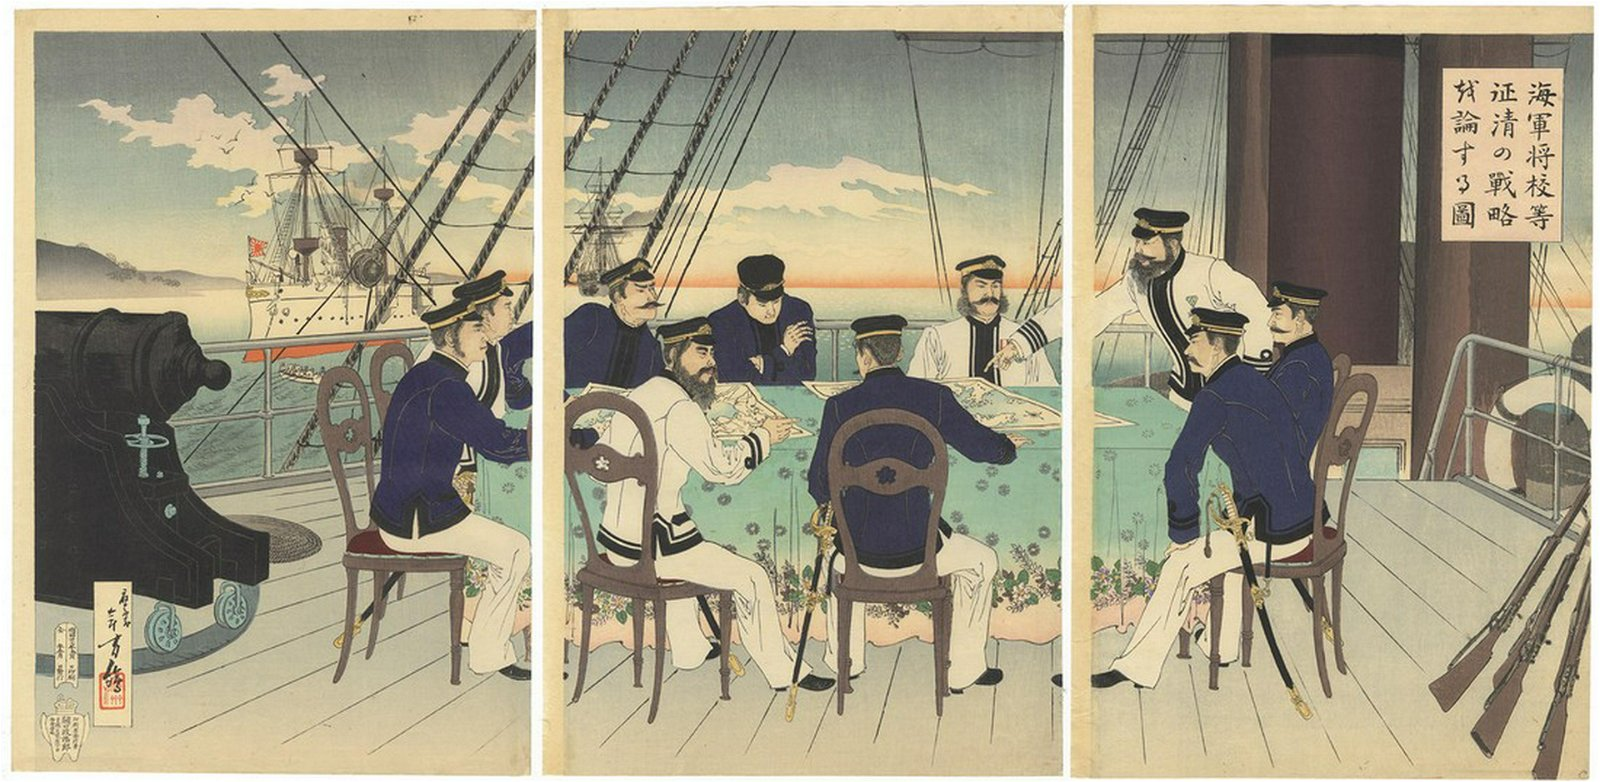 Mizuno Toshikata (1866-1908): Naval officers discussing